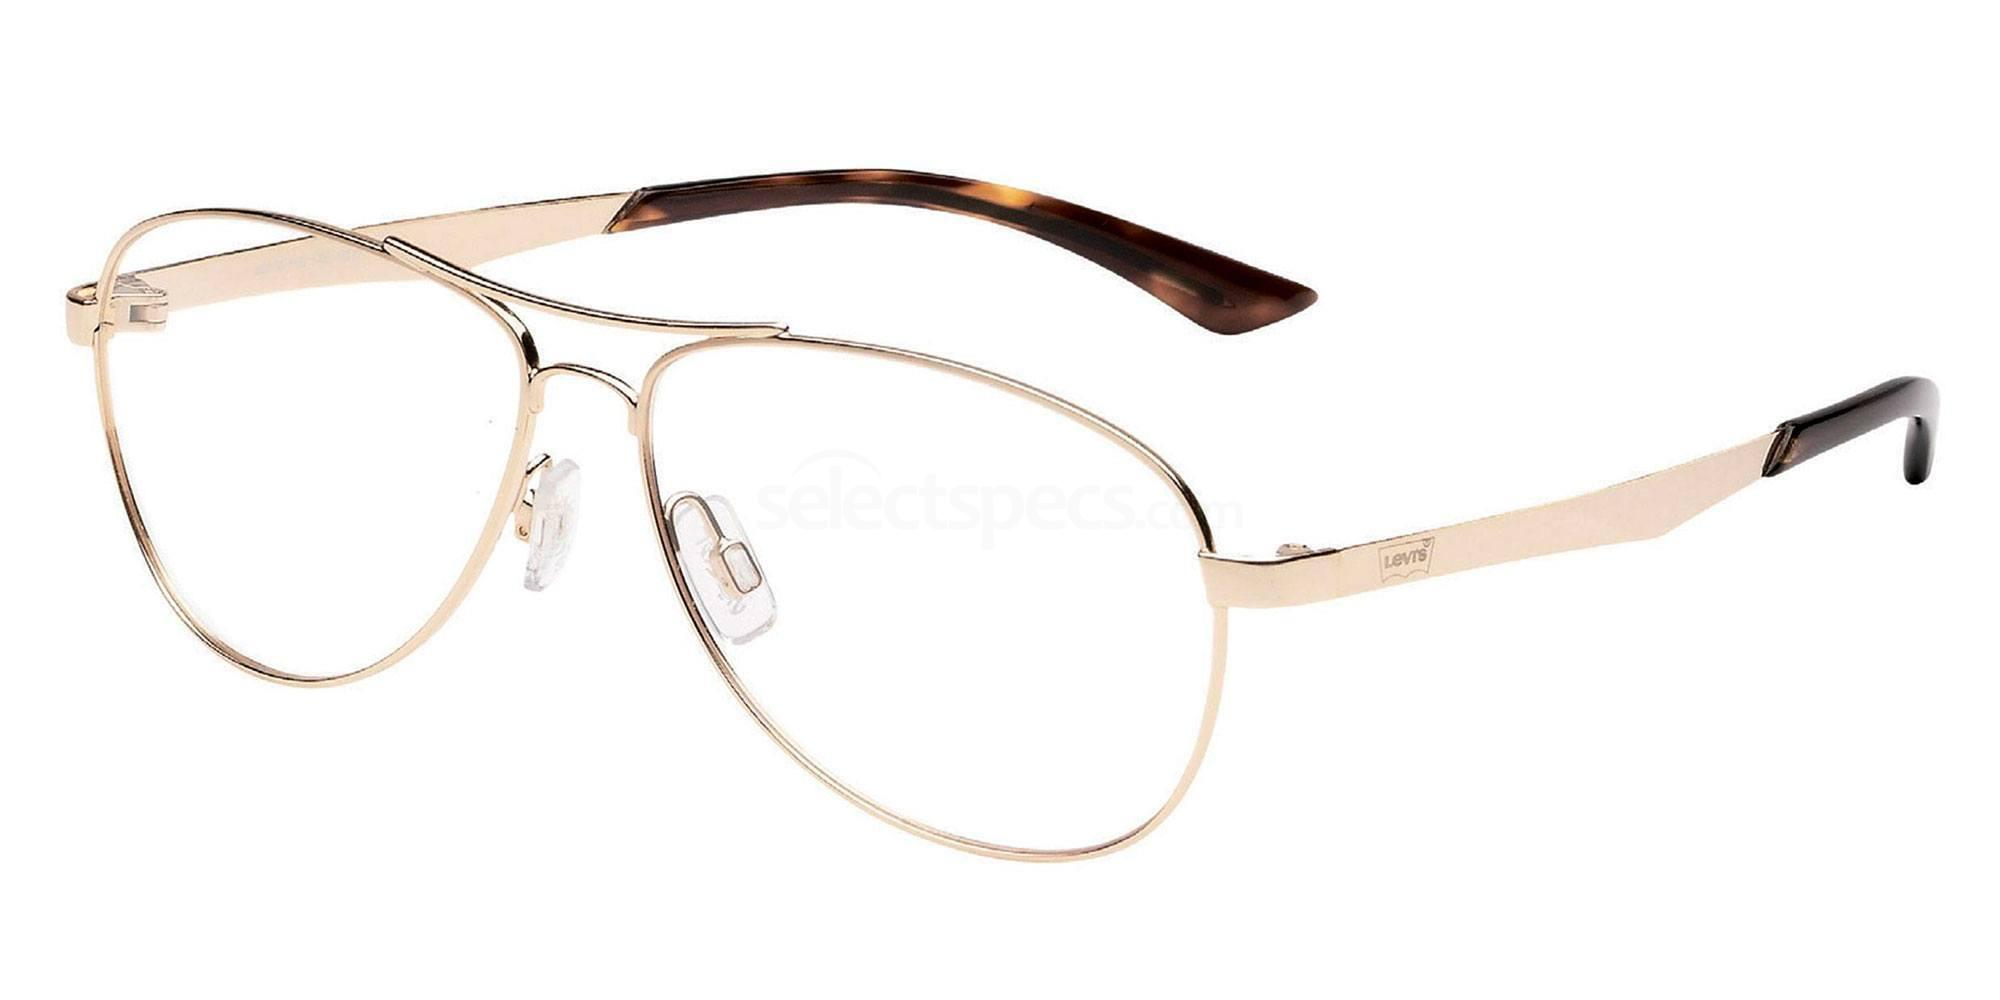 Aviator Style Prescription Eyeglasses | Louisiana Bucket Brigade